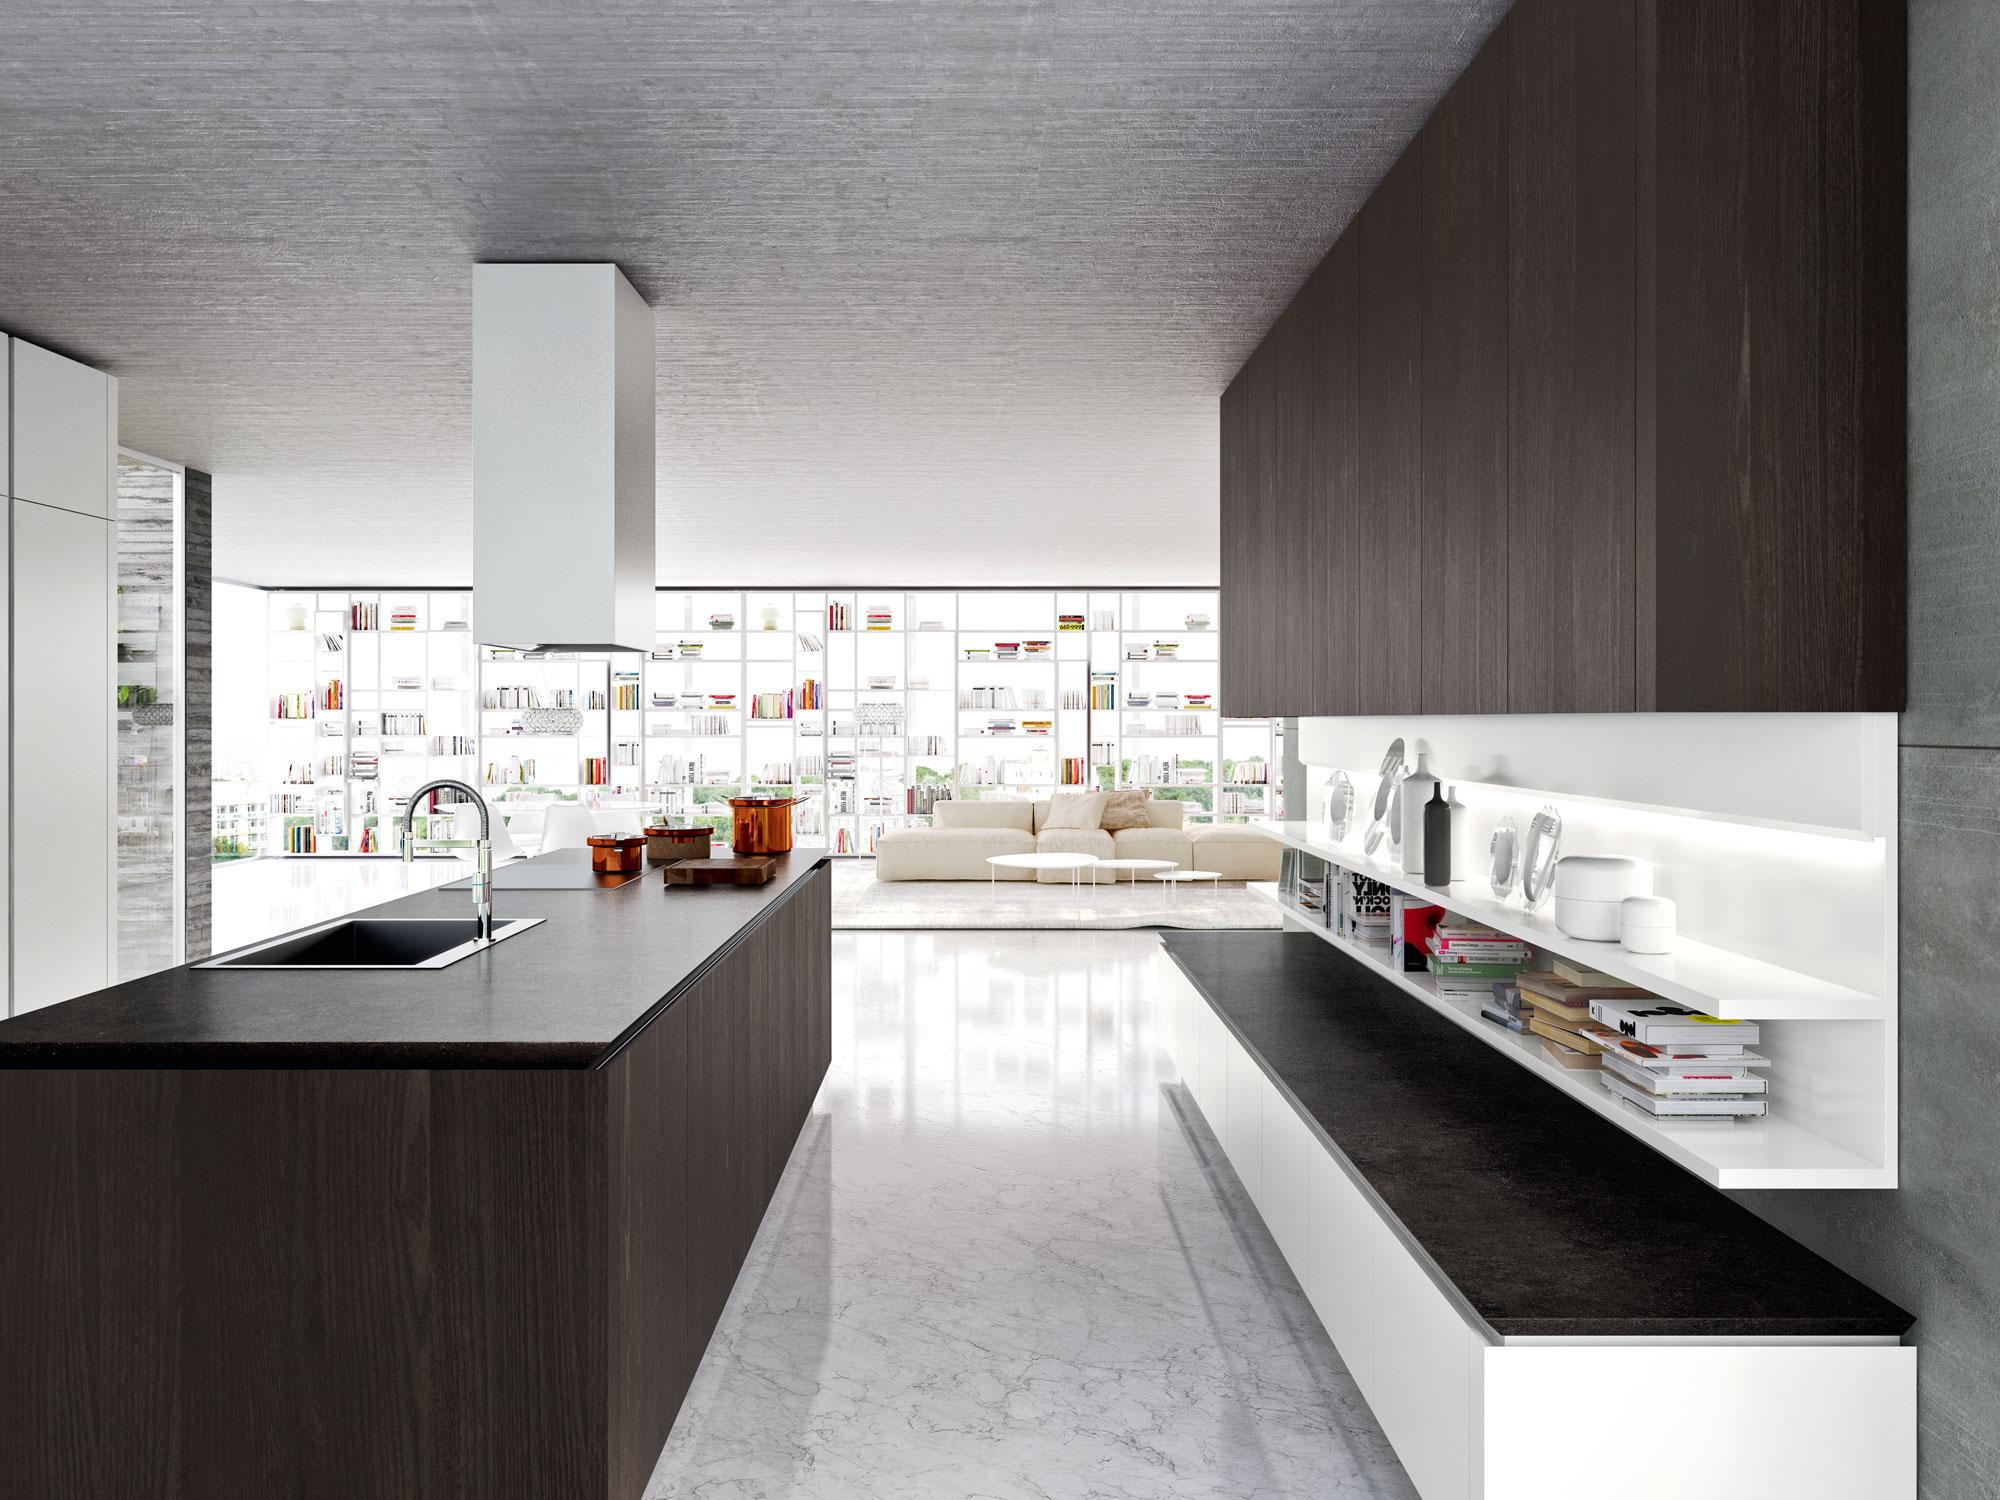 cucina-Idea-olmo-caffe-2 (2)